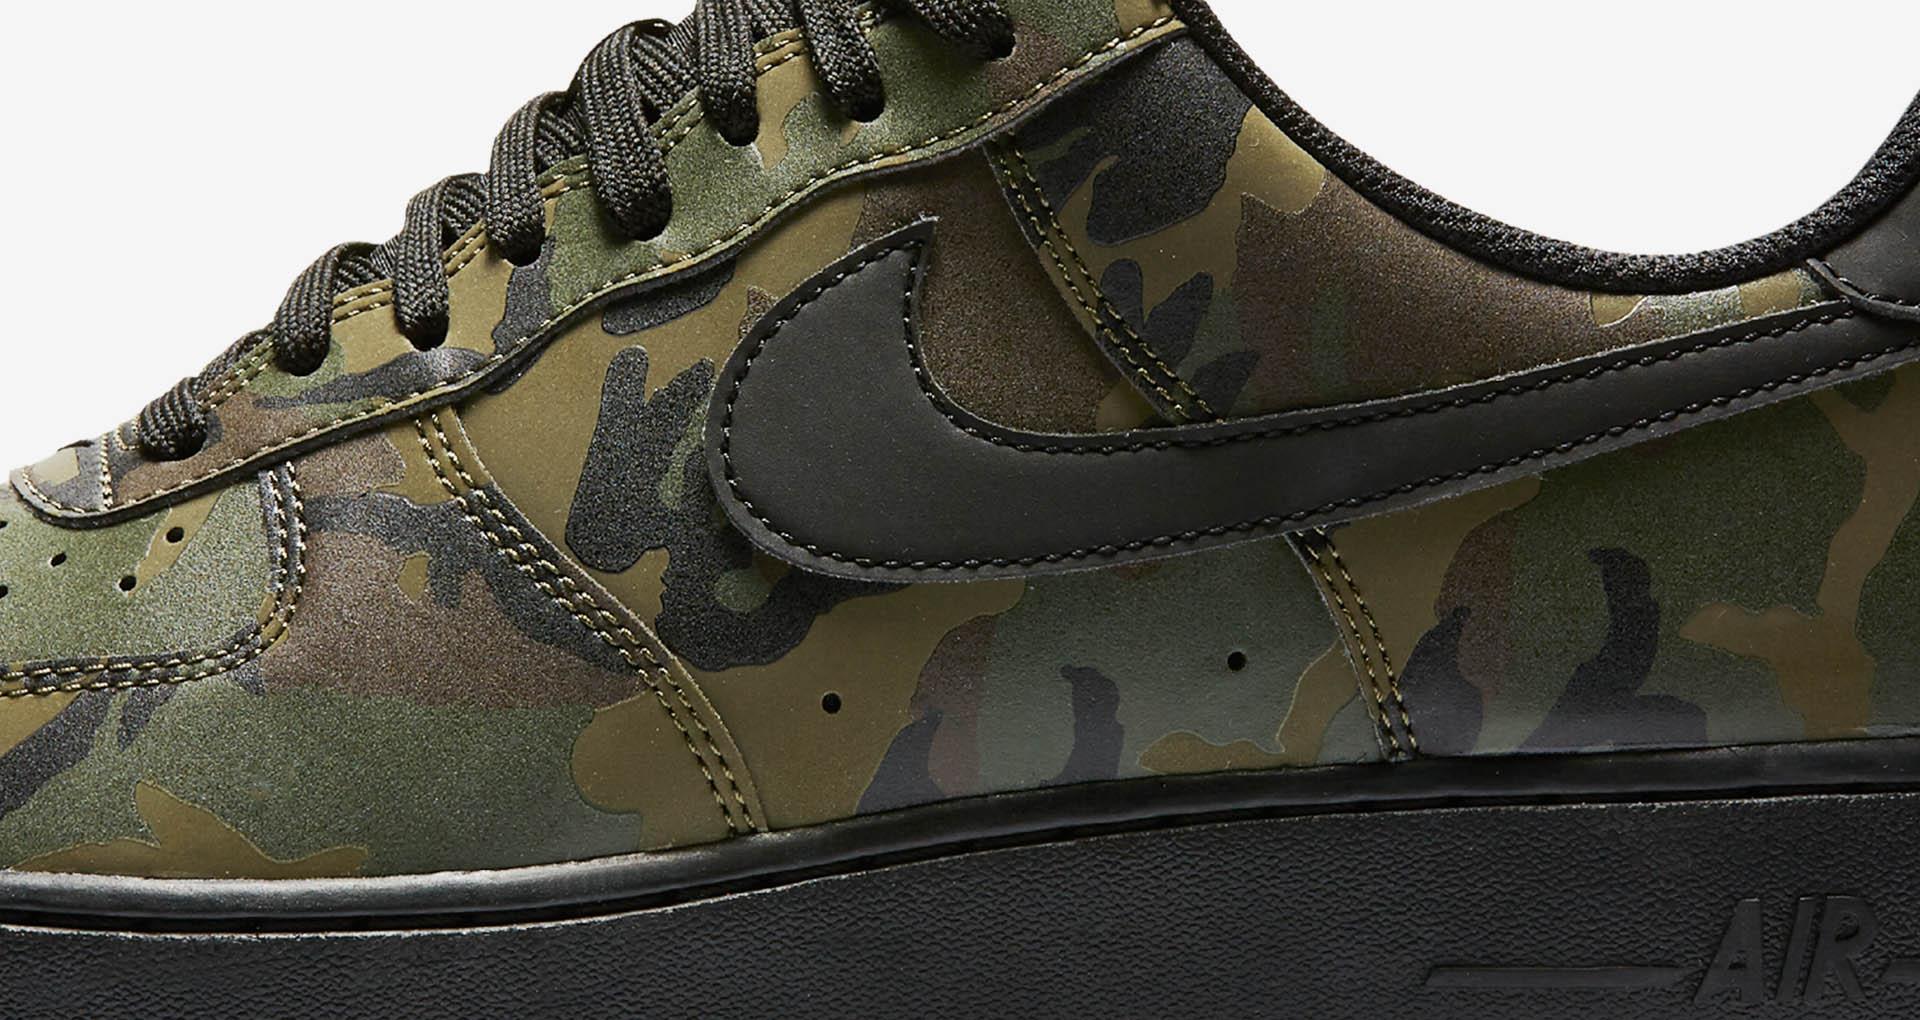 reputable site ca74a 2d815 Nike Air Force 1 Camo Medium Olive - Air 23 - Air Jordan Release Dates,  Foamposite, Air Max, and More